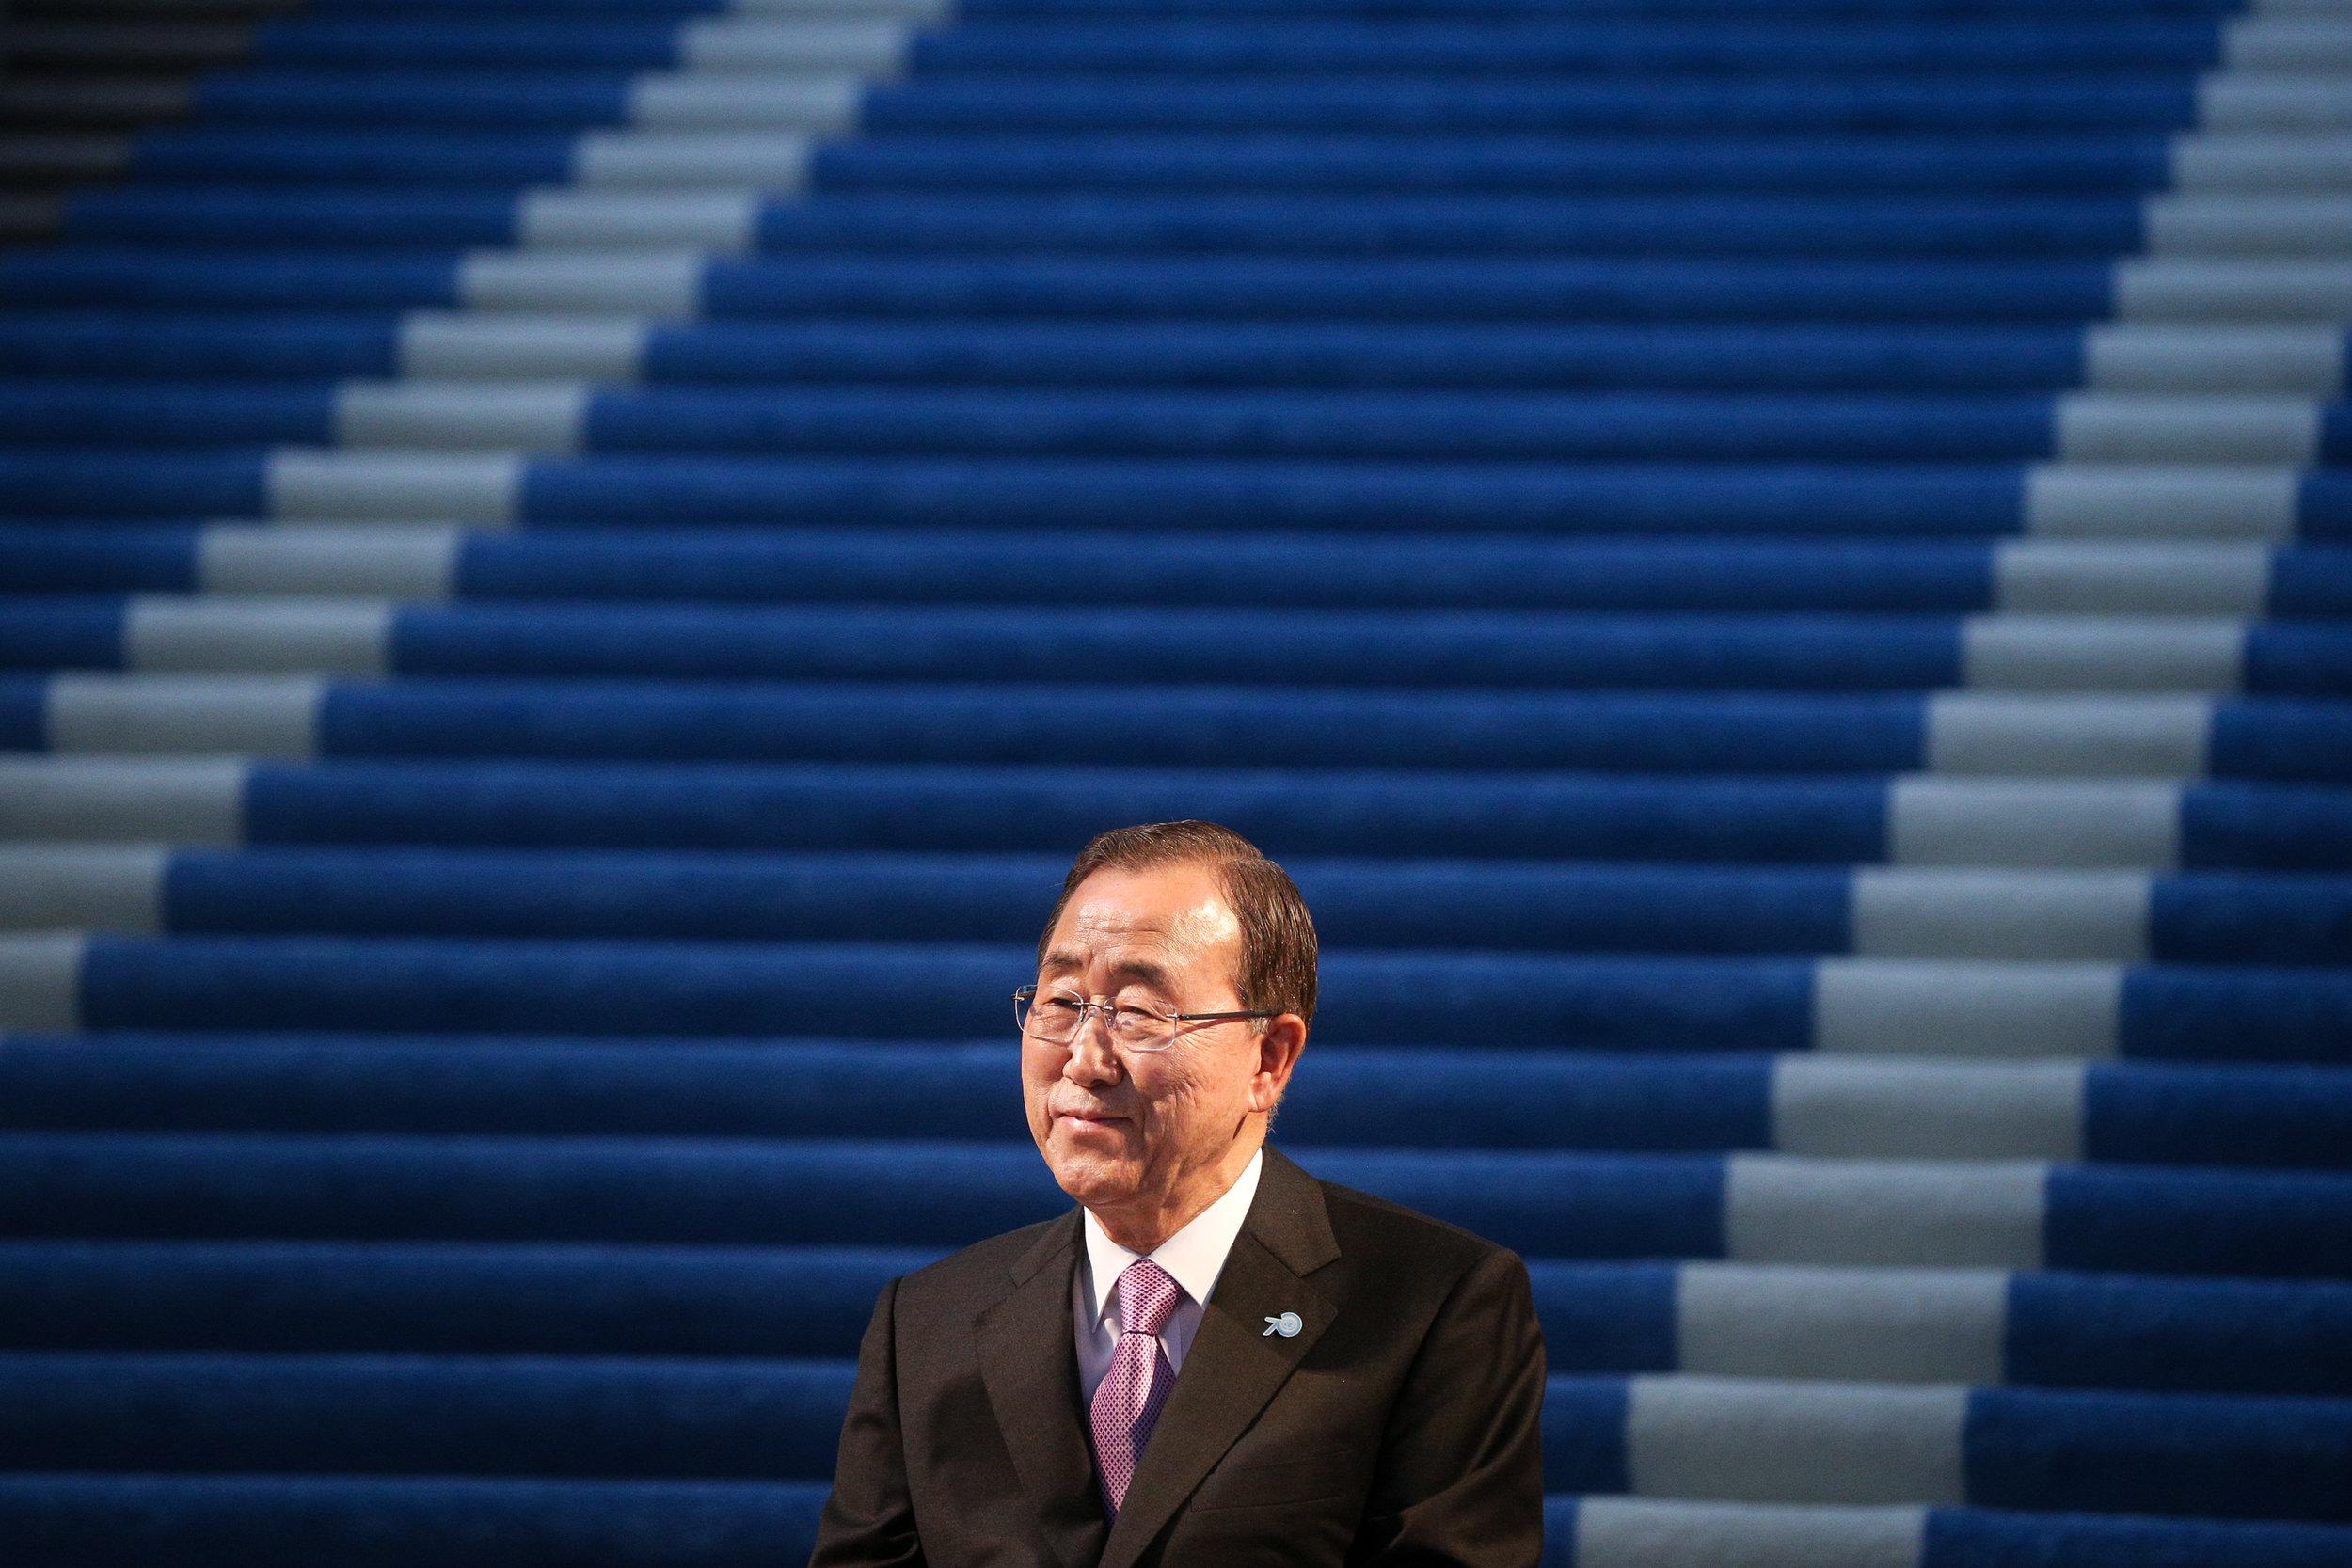 Ban Ki-moon, eighth Secretary-General of the United Nations